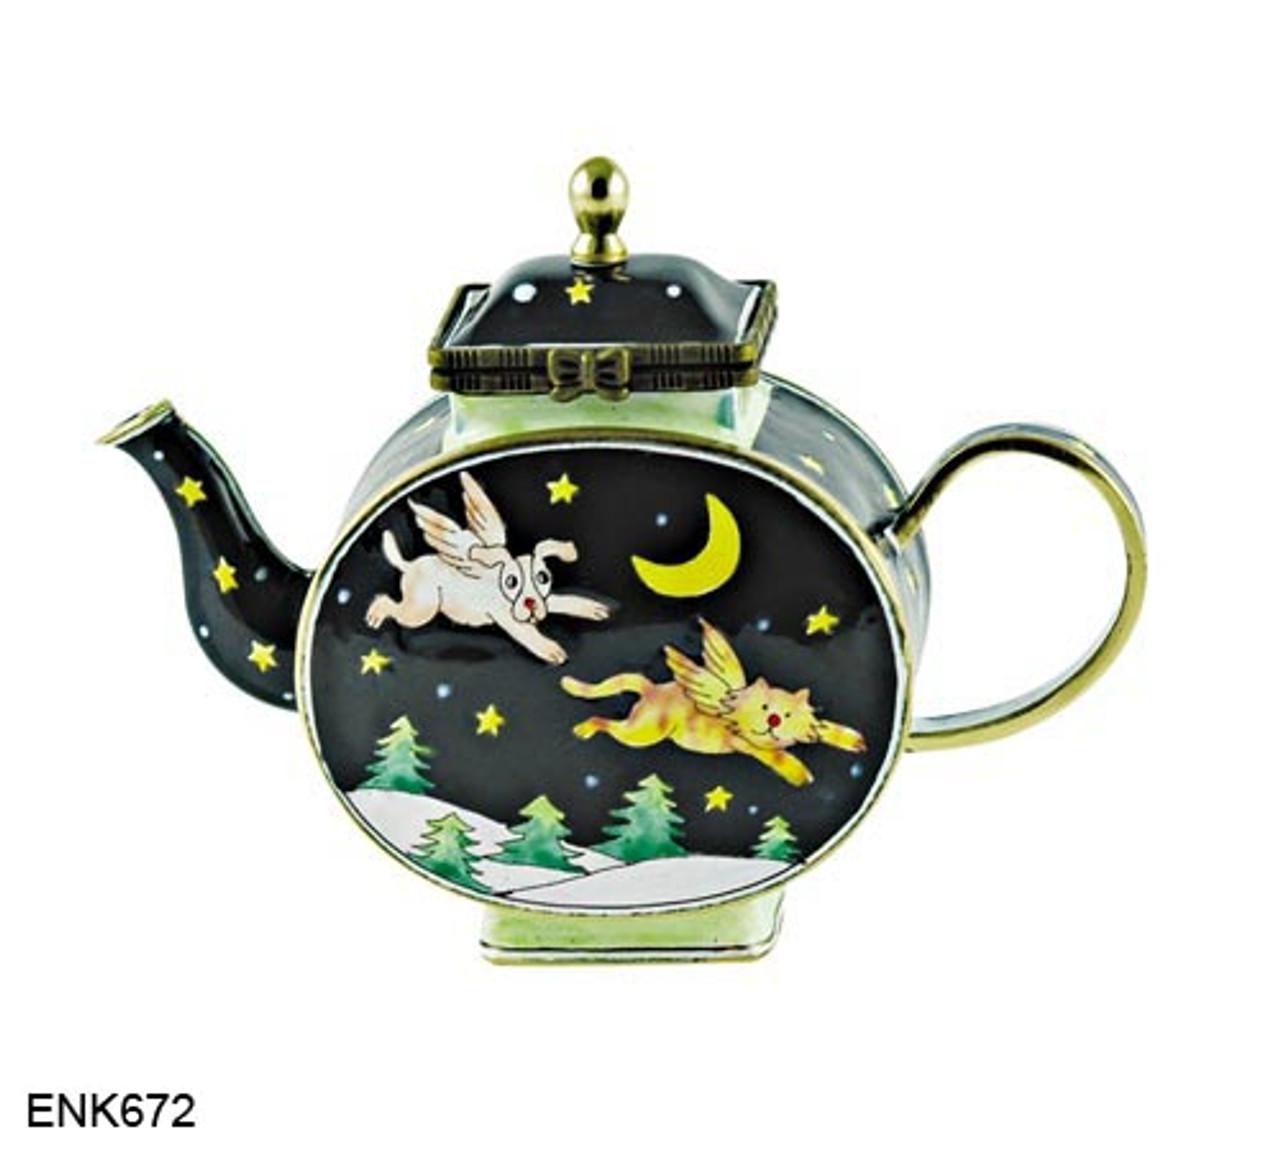 ENK672 Kelvin Chen Cat and Dog Flying Enamel Hinged Teapot